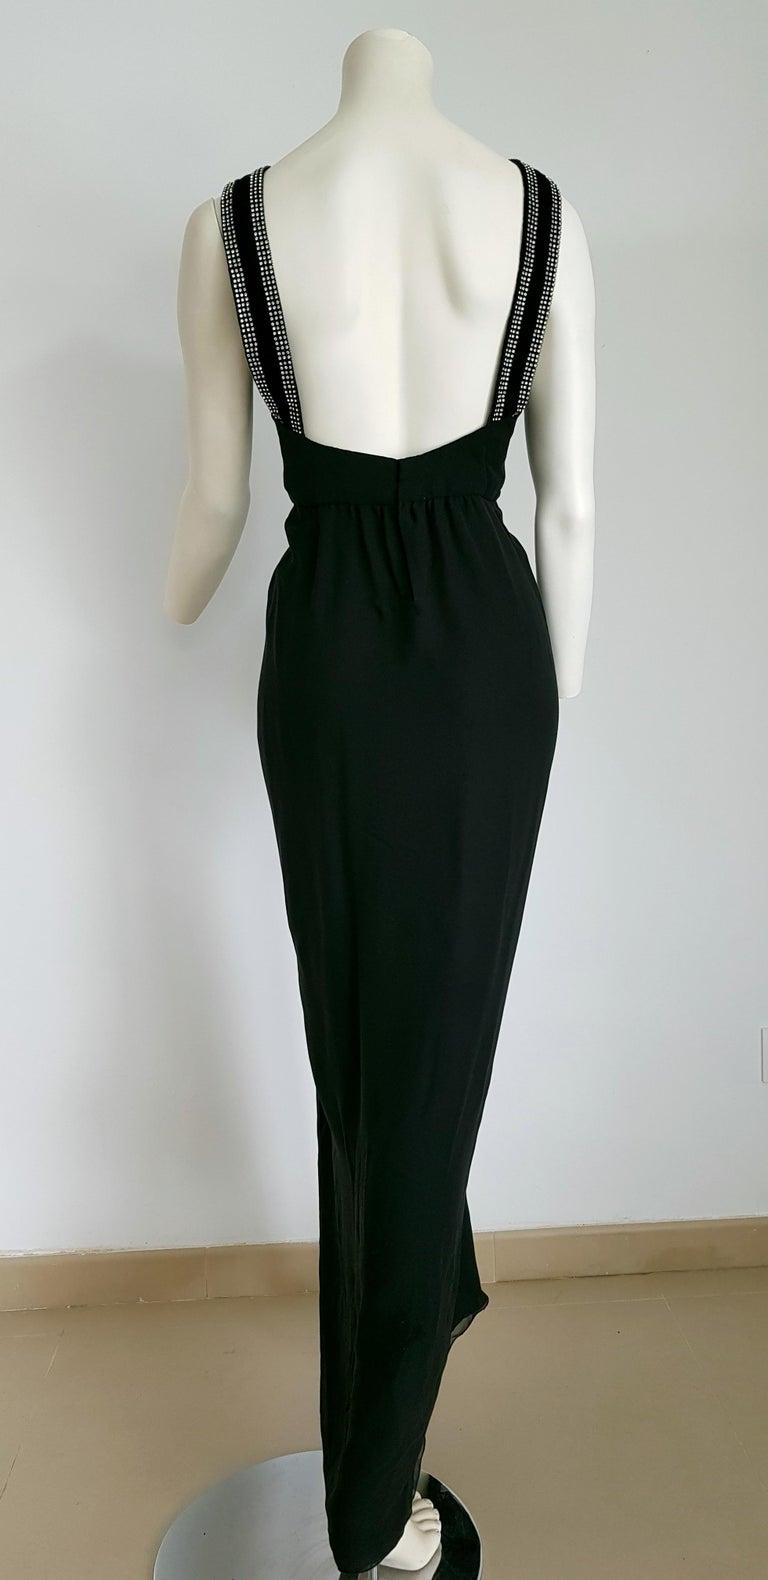 Women's VALENTINO Haute Couture swarovski diamonds on black hems silk gown - Unworn, new For Sale